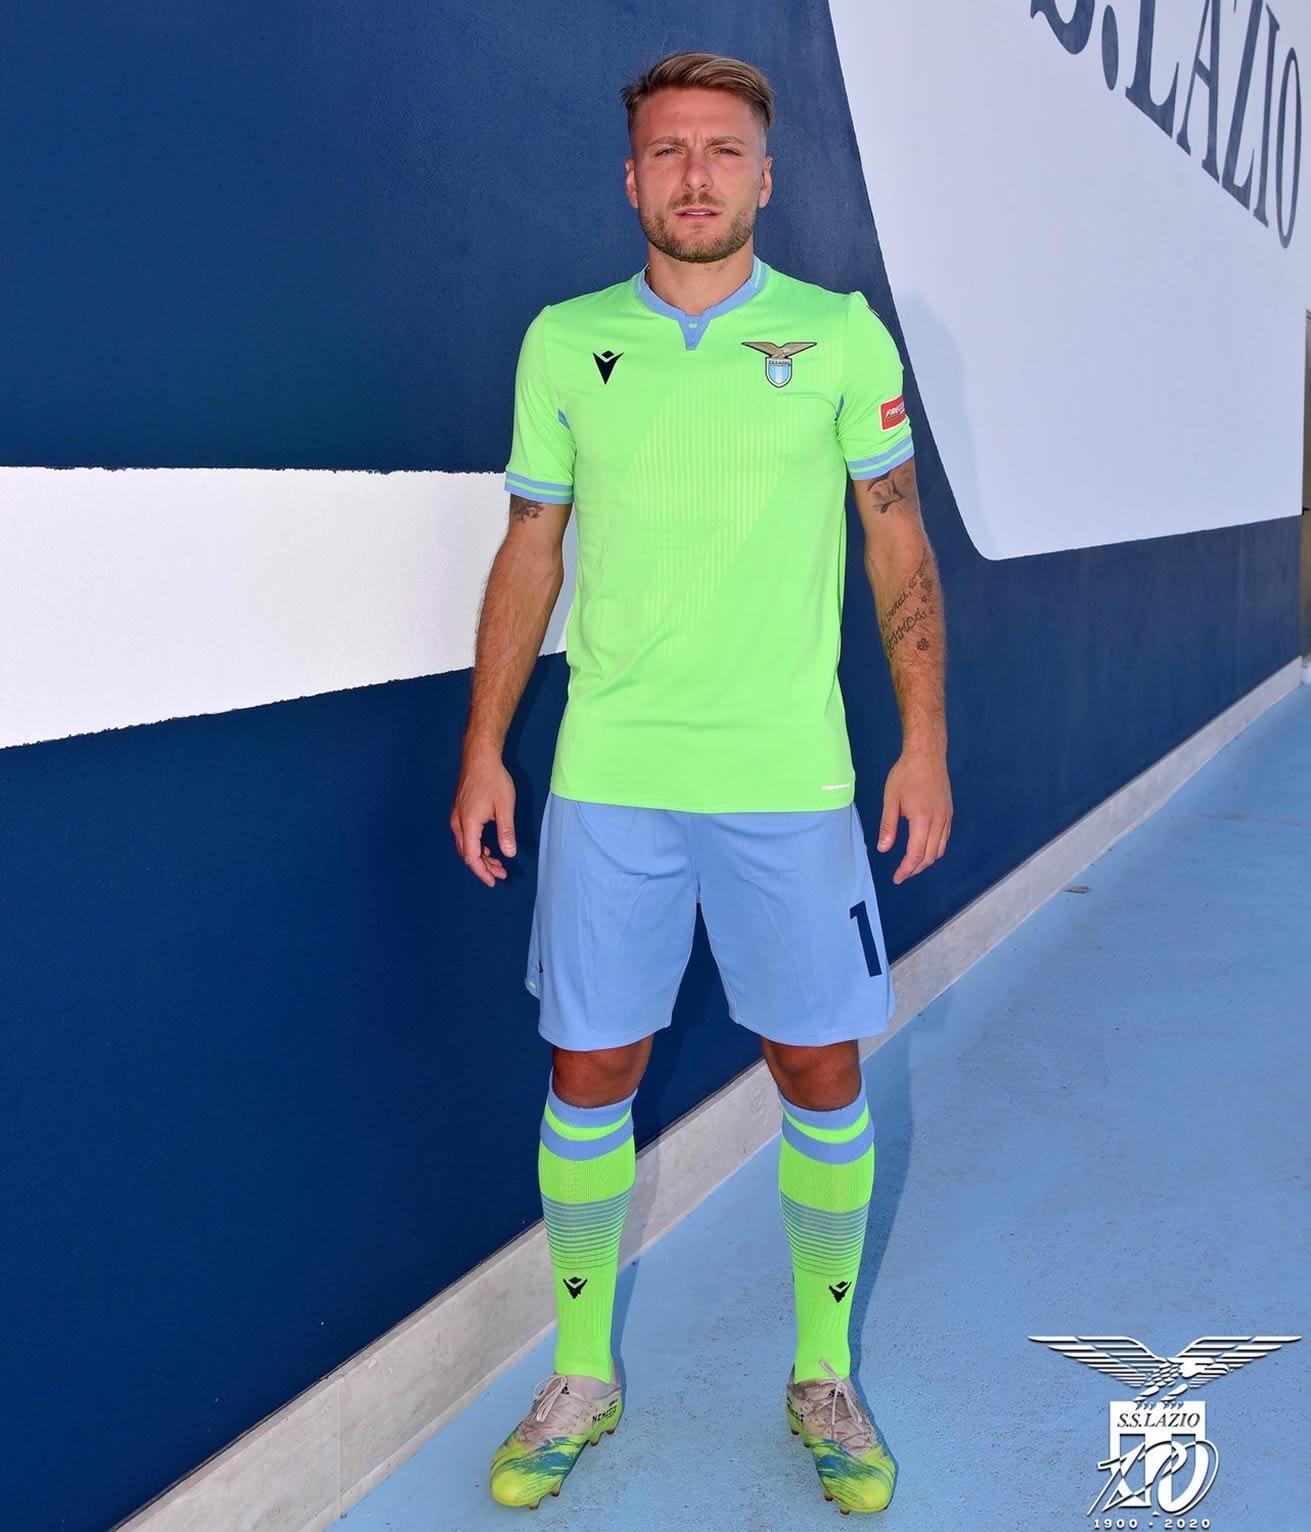 Camiseta suplente Macron de la Lazio 2020/2021 | Imagen Twitter Oficial